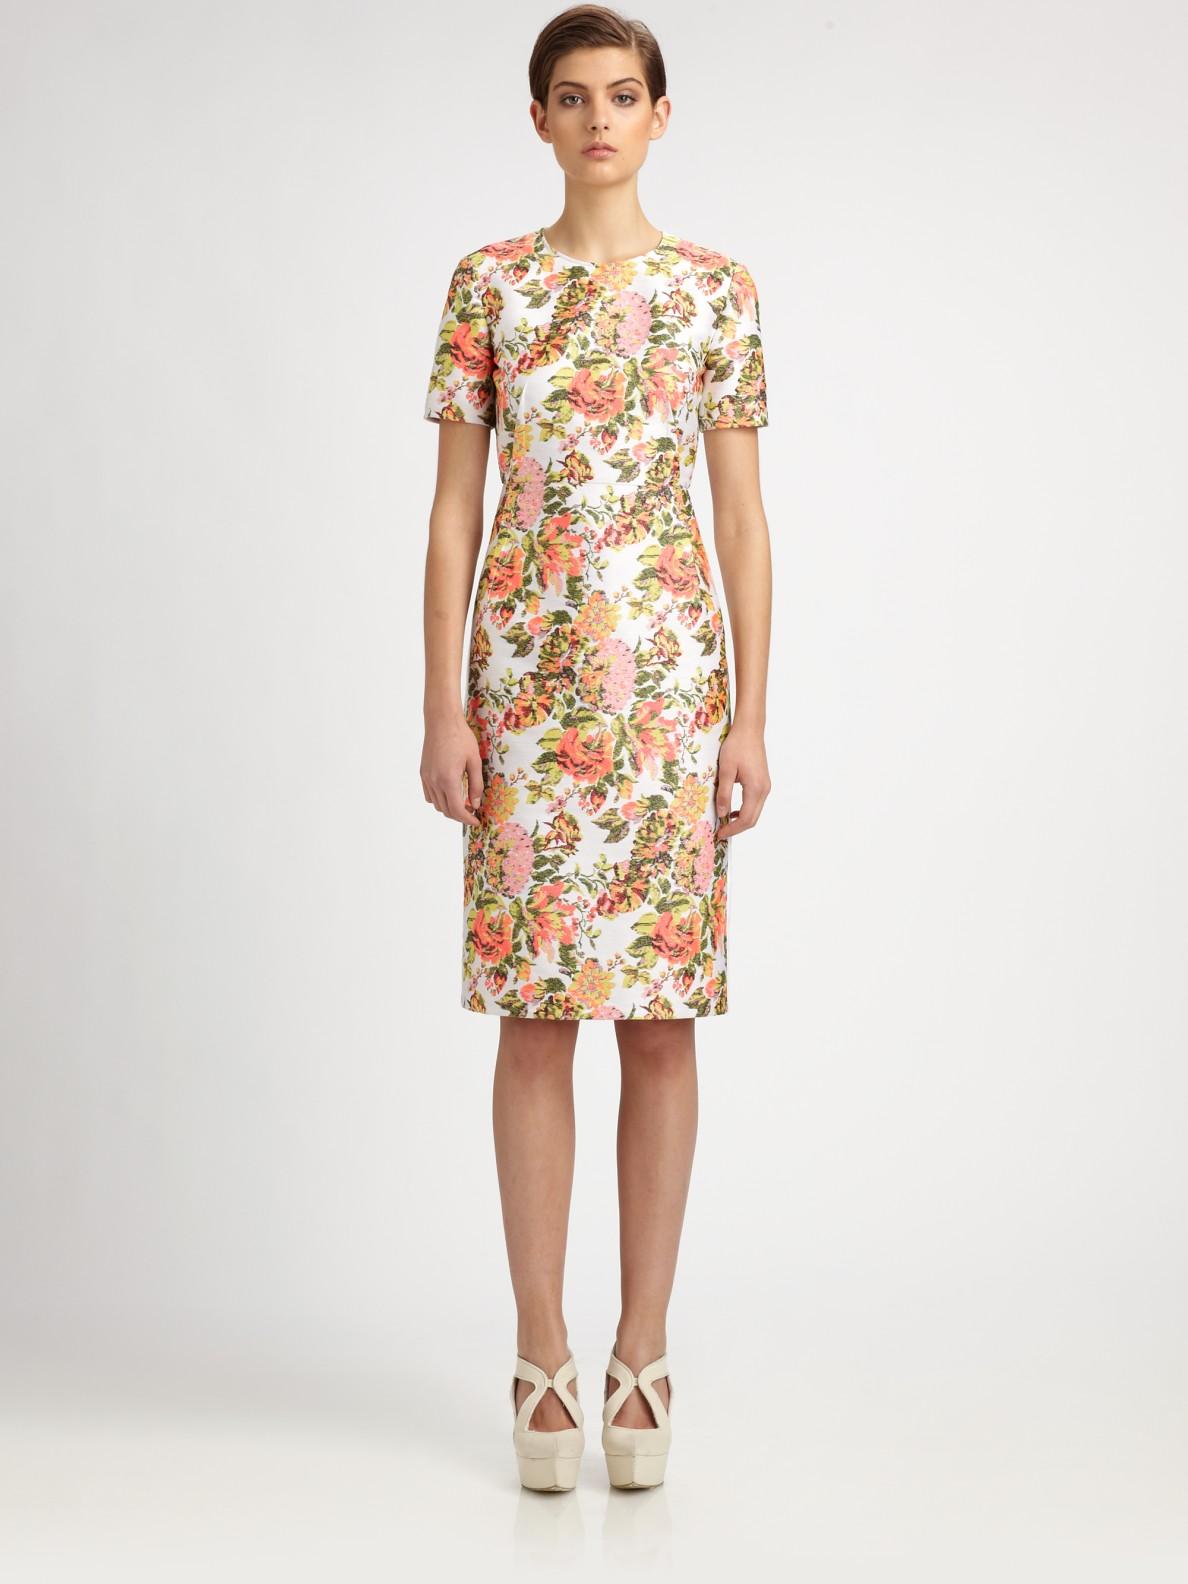 Stella mccartney Floral Jacquard - 184.0KB